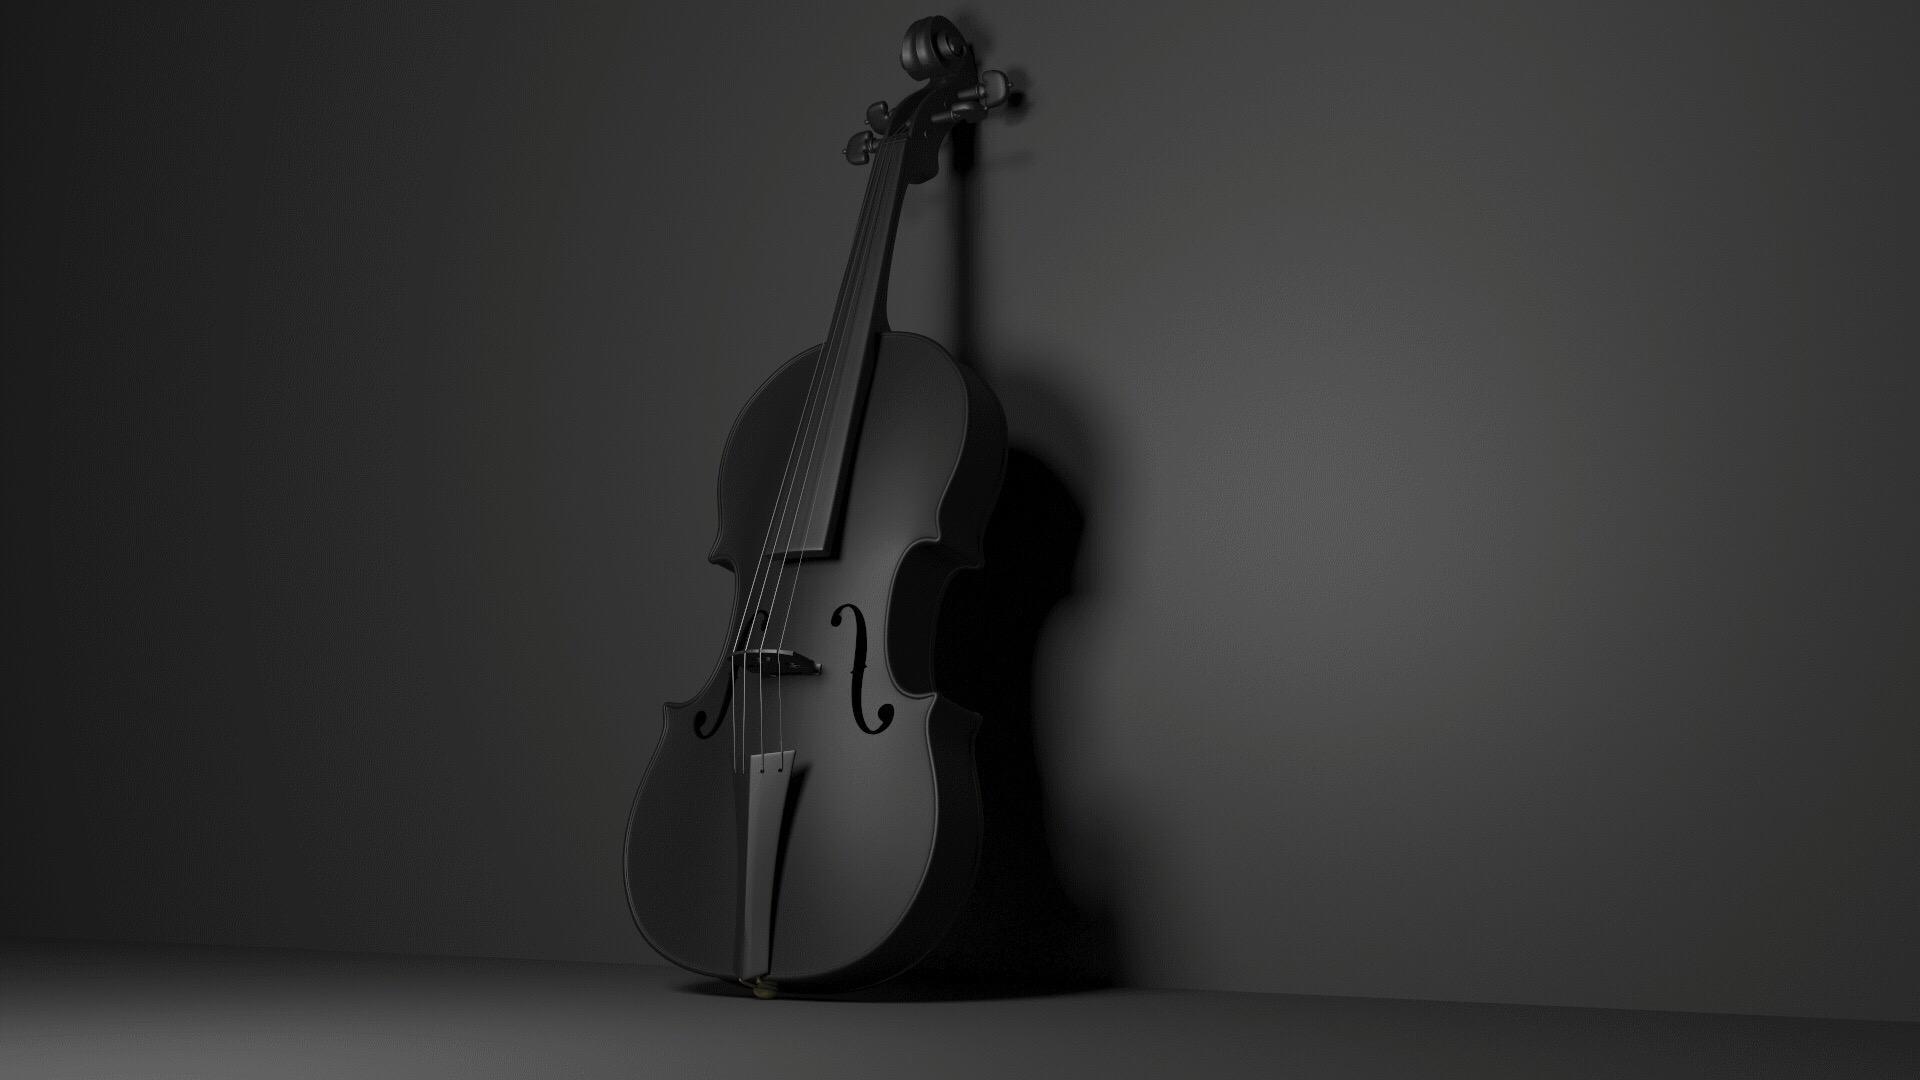 Black Violin Hd Wallpaper